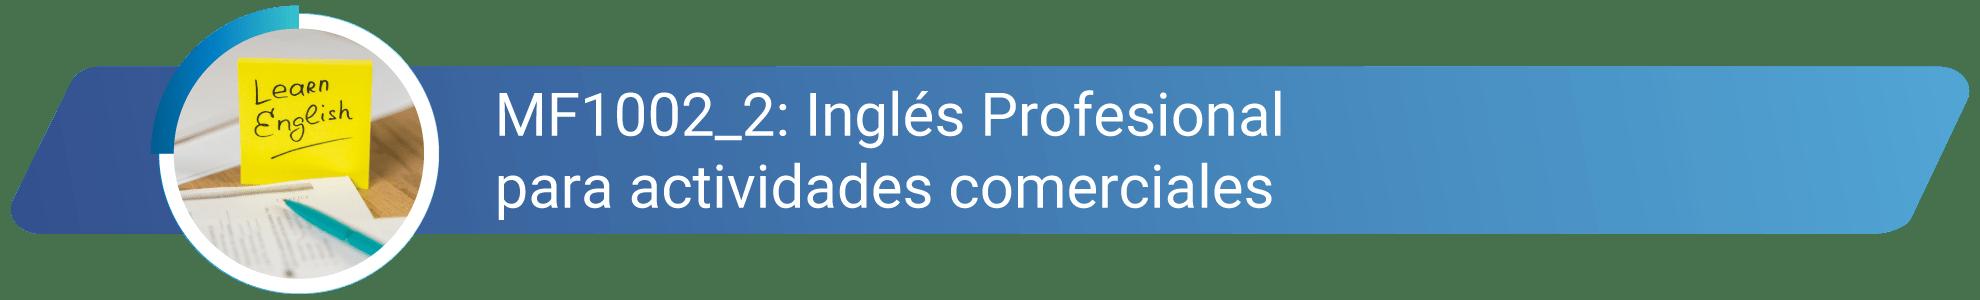 MF1002_2 - Inglés profesional para actividades comerciales